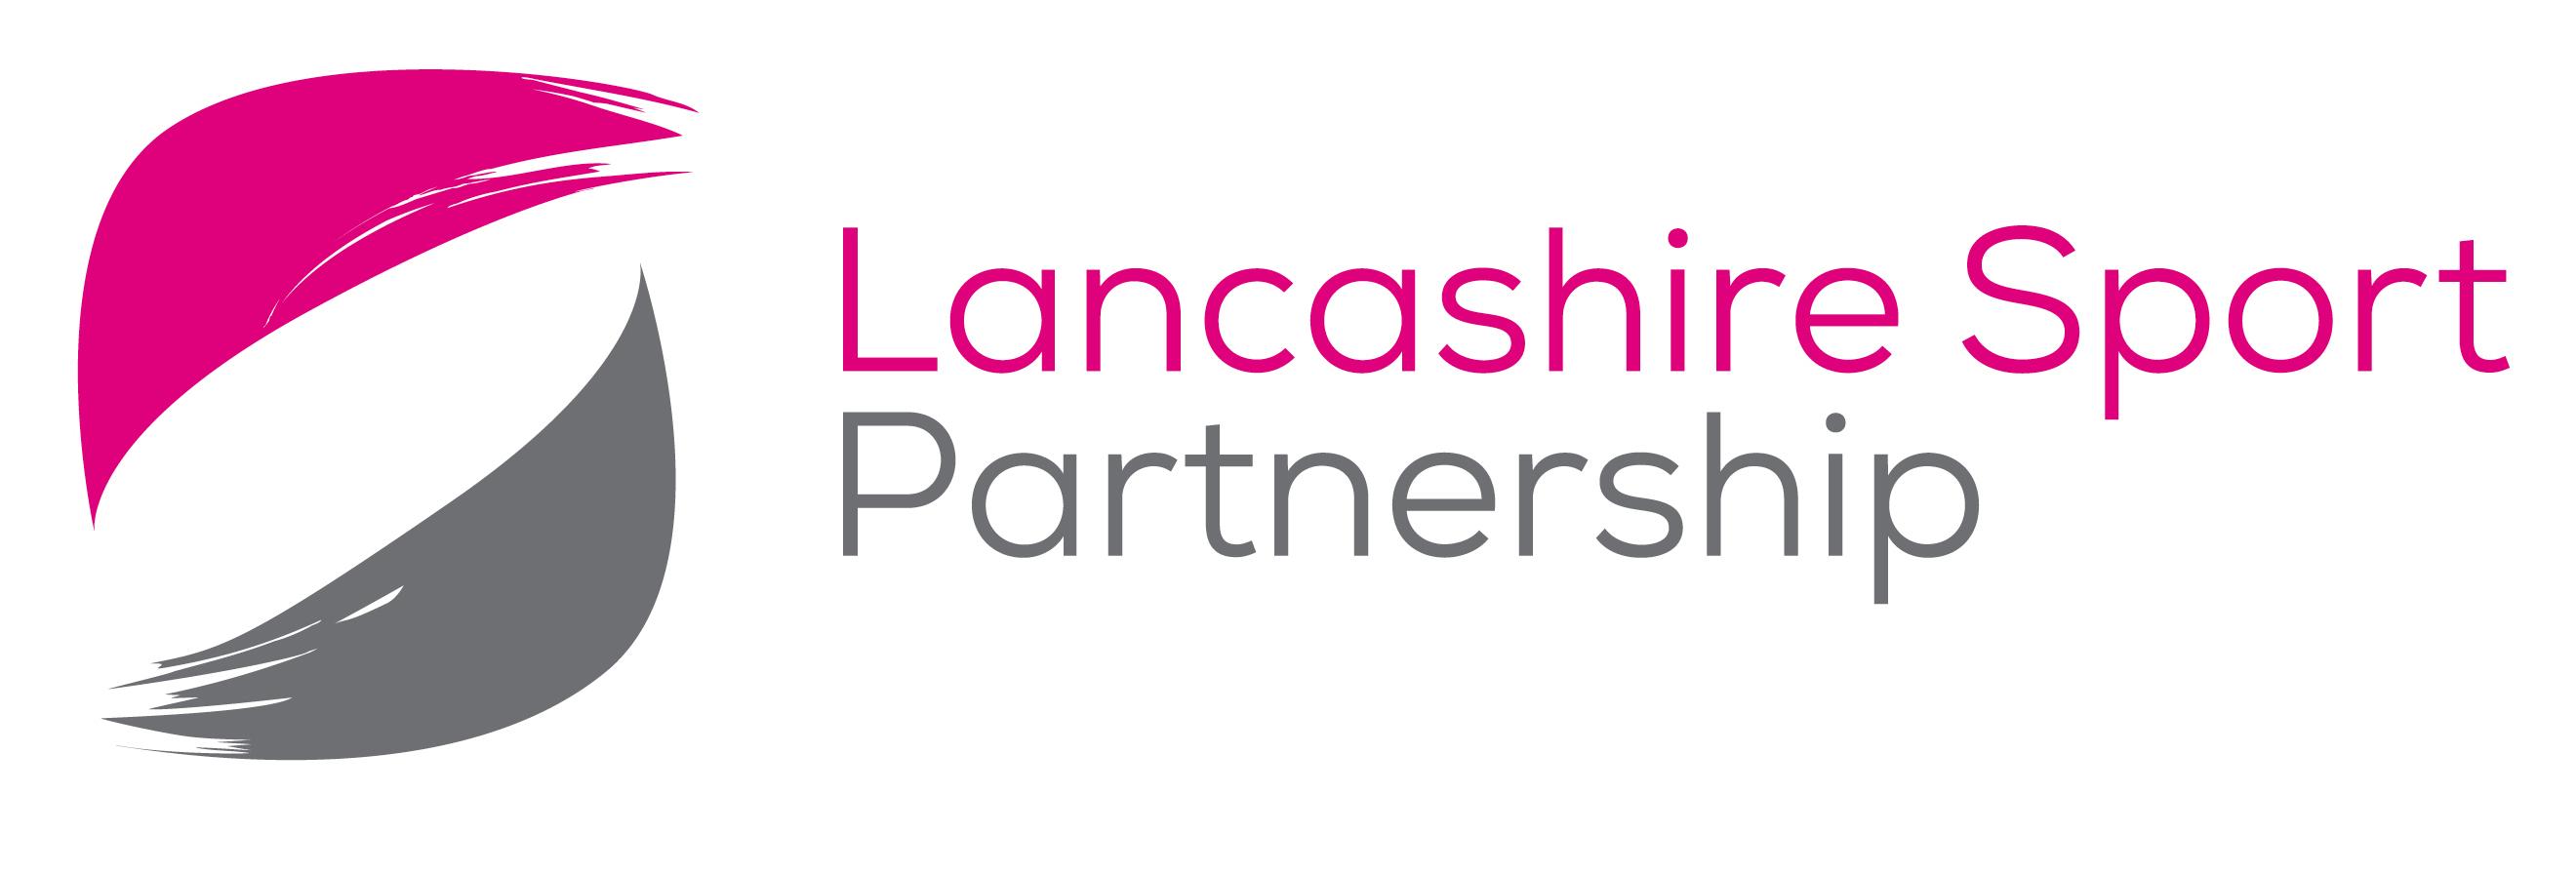 Lancashire Sport Partnership